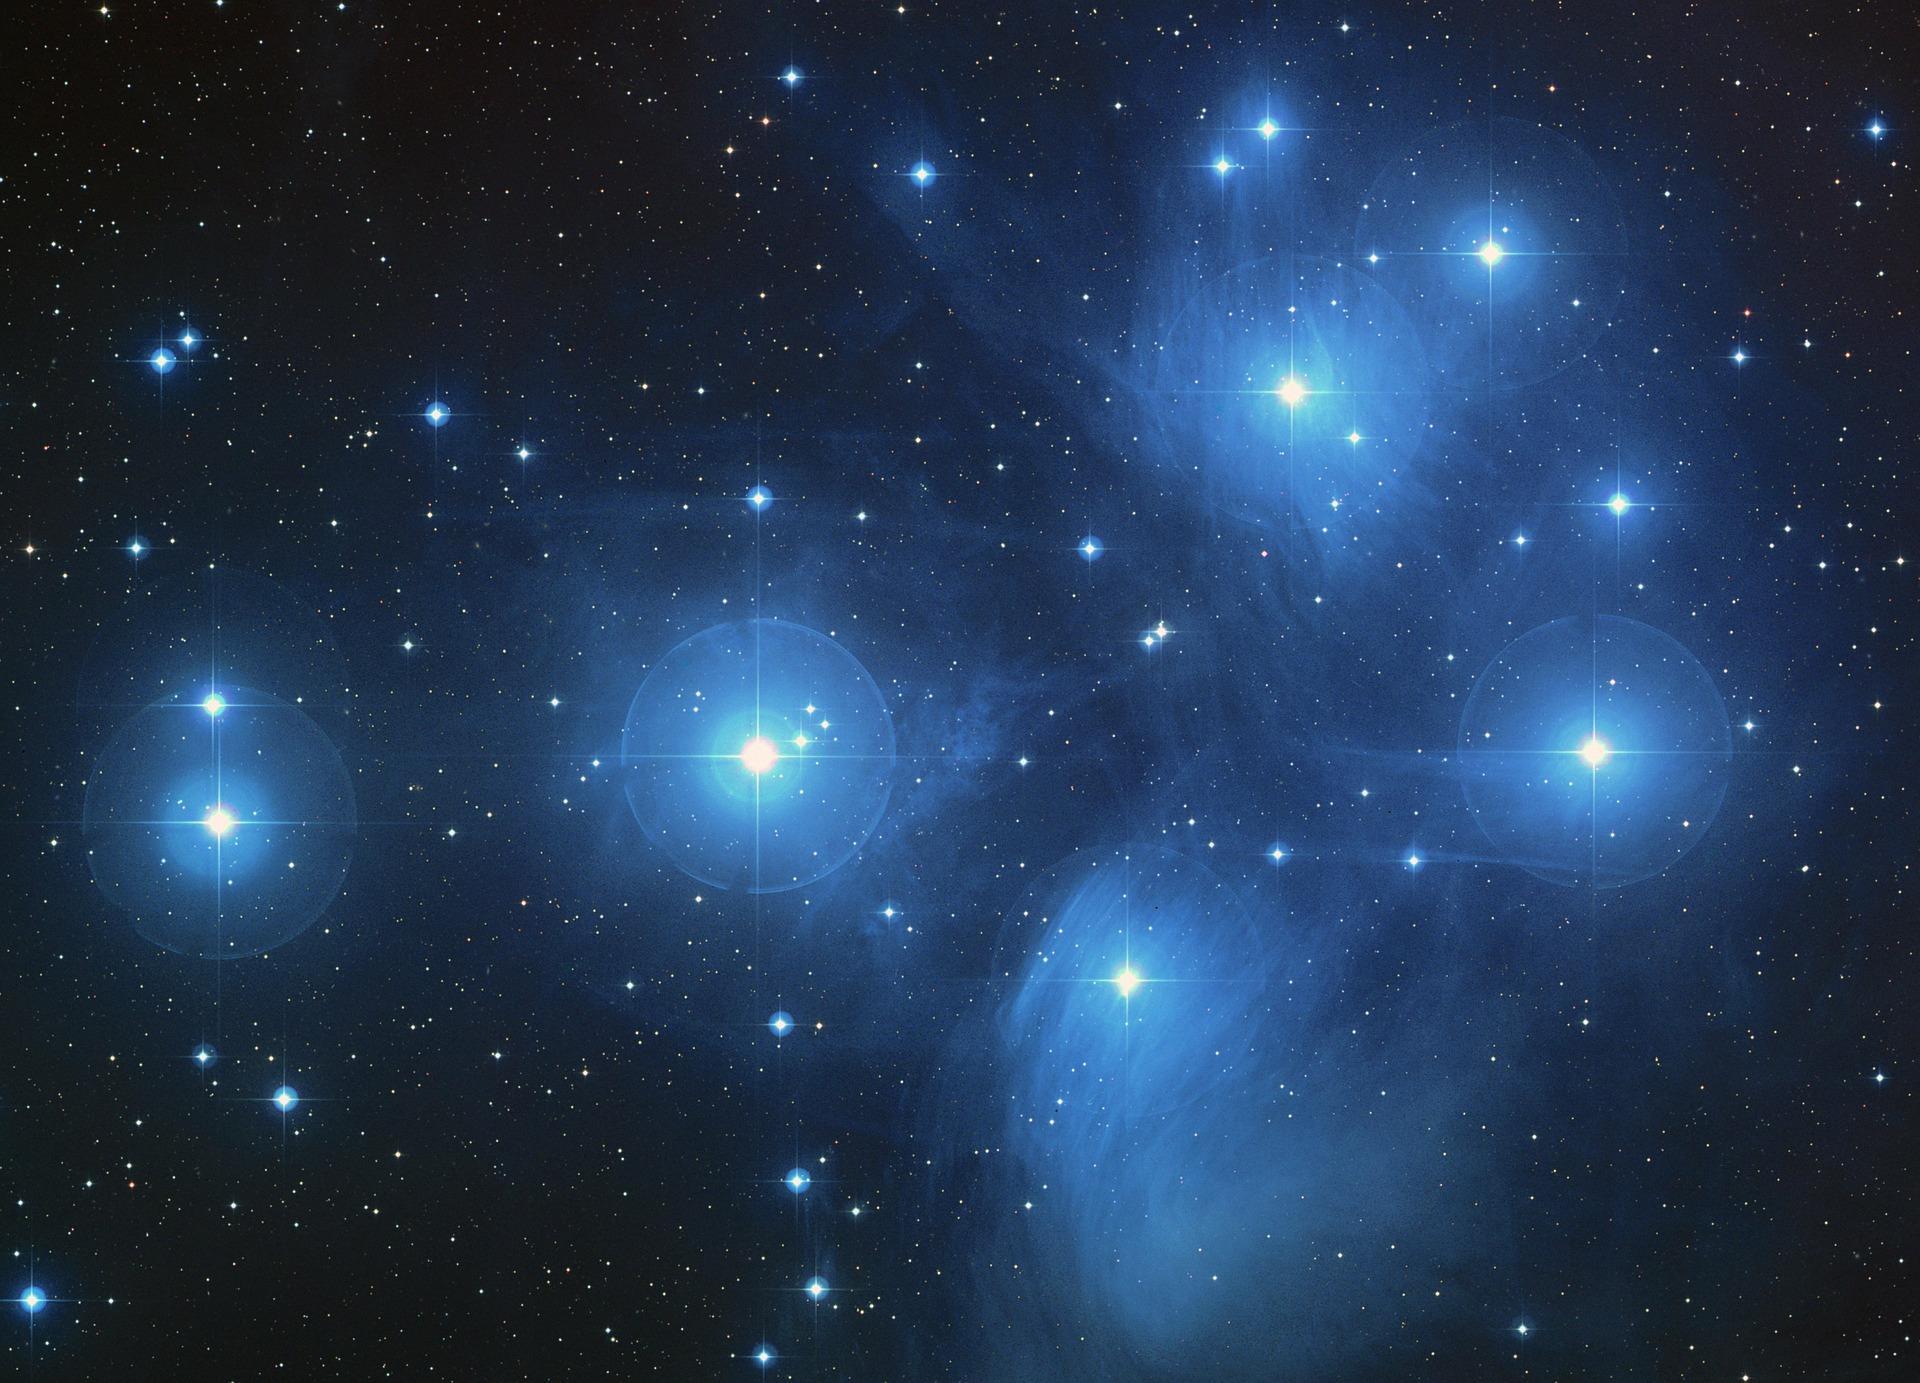 the pleiades star cluster 11637 1920 - Leurre fatidique